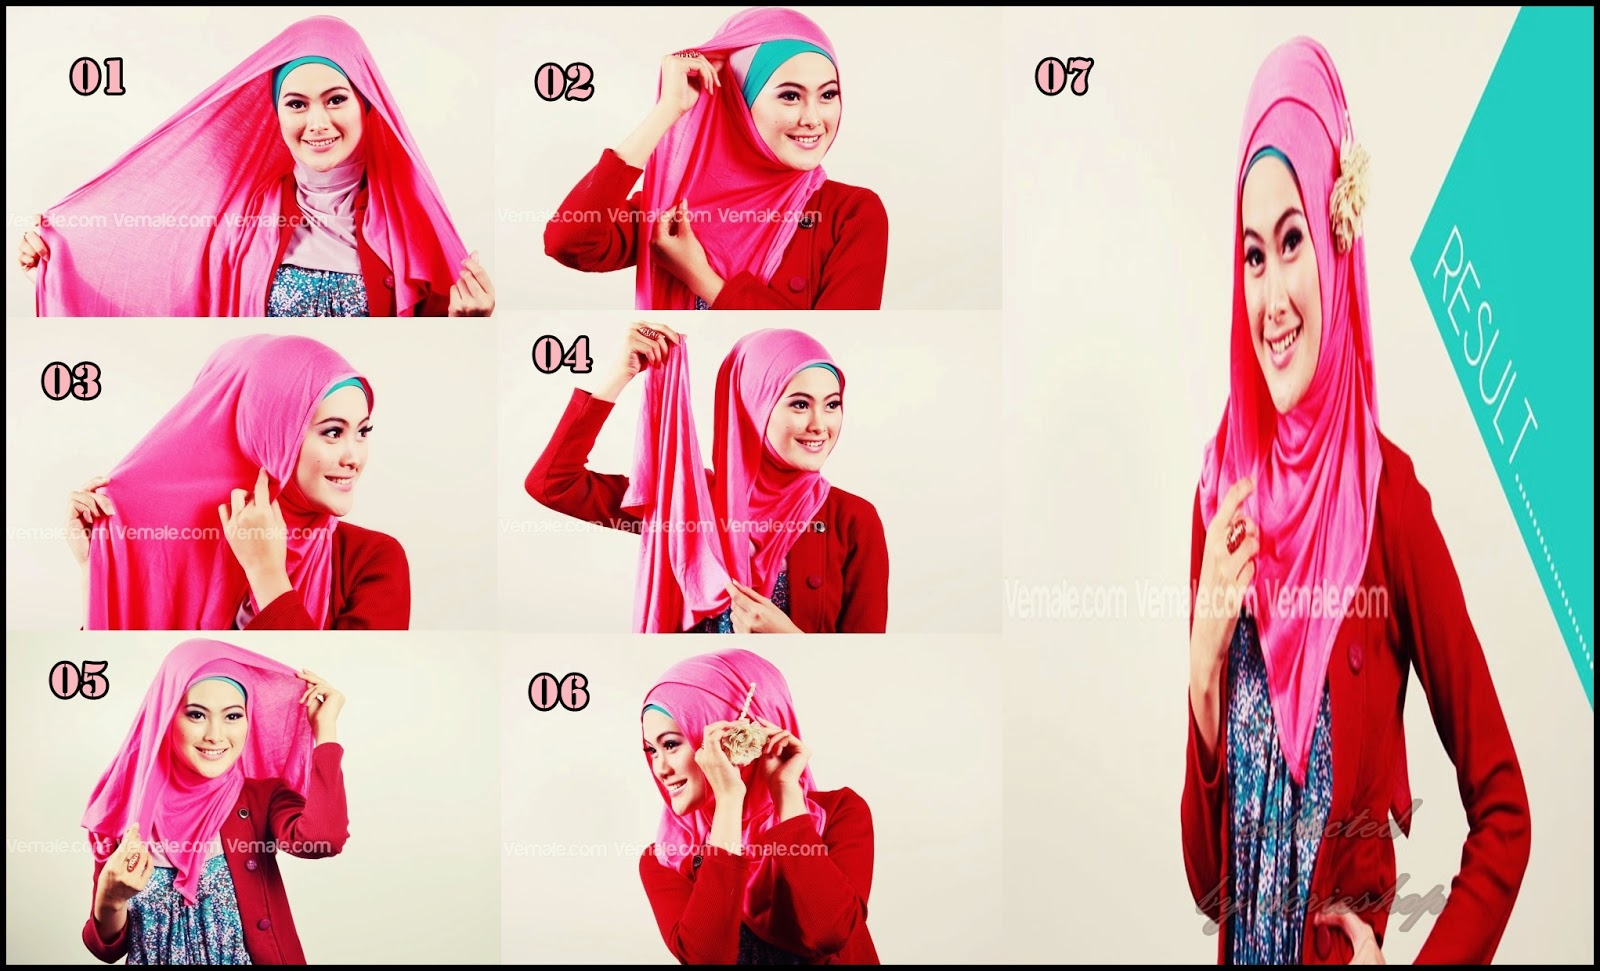 Cara Memakai Jilbab Pashmina April Jasmine Untuk Pesta Yang Simple Dan Mudah